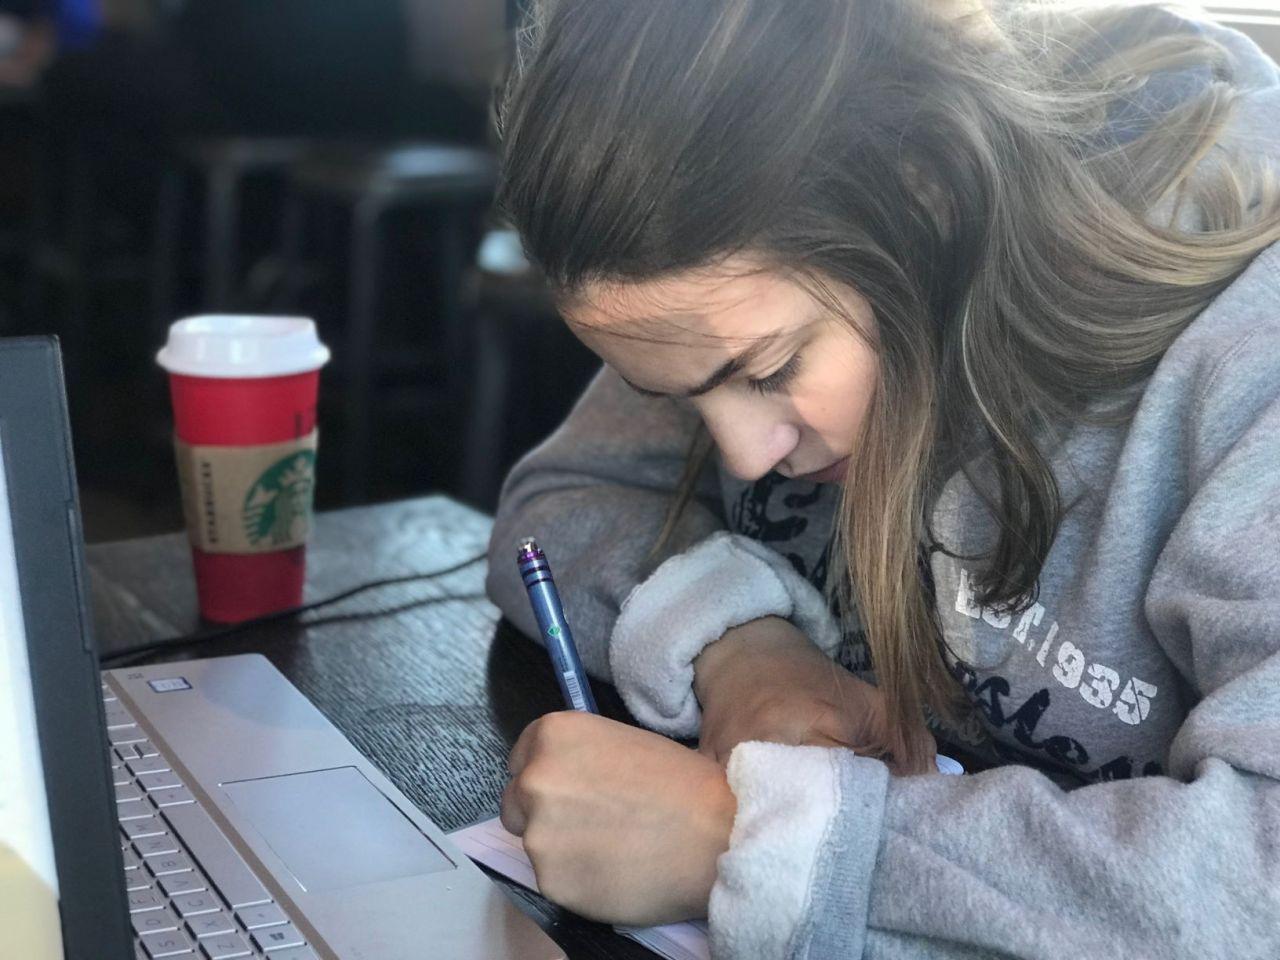 studypic